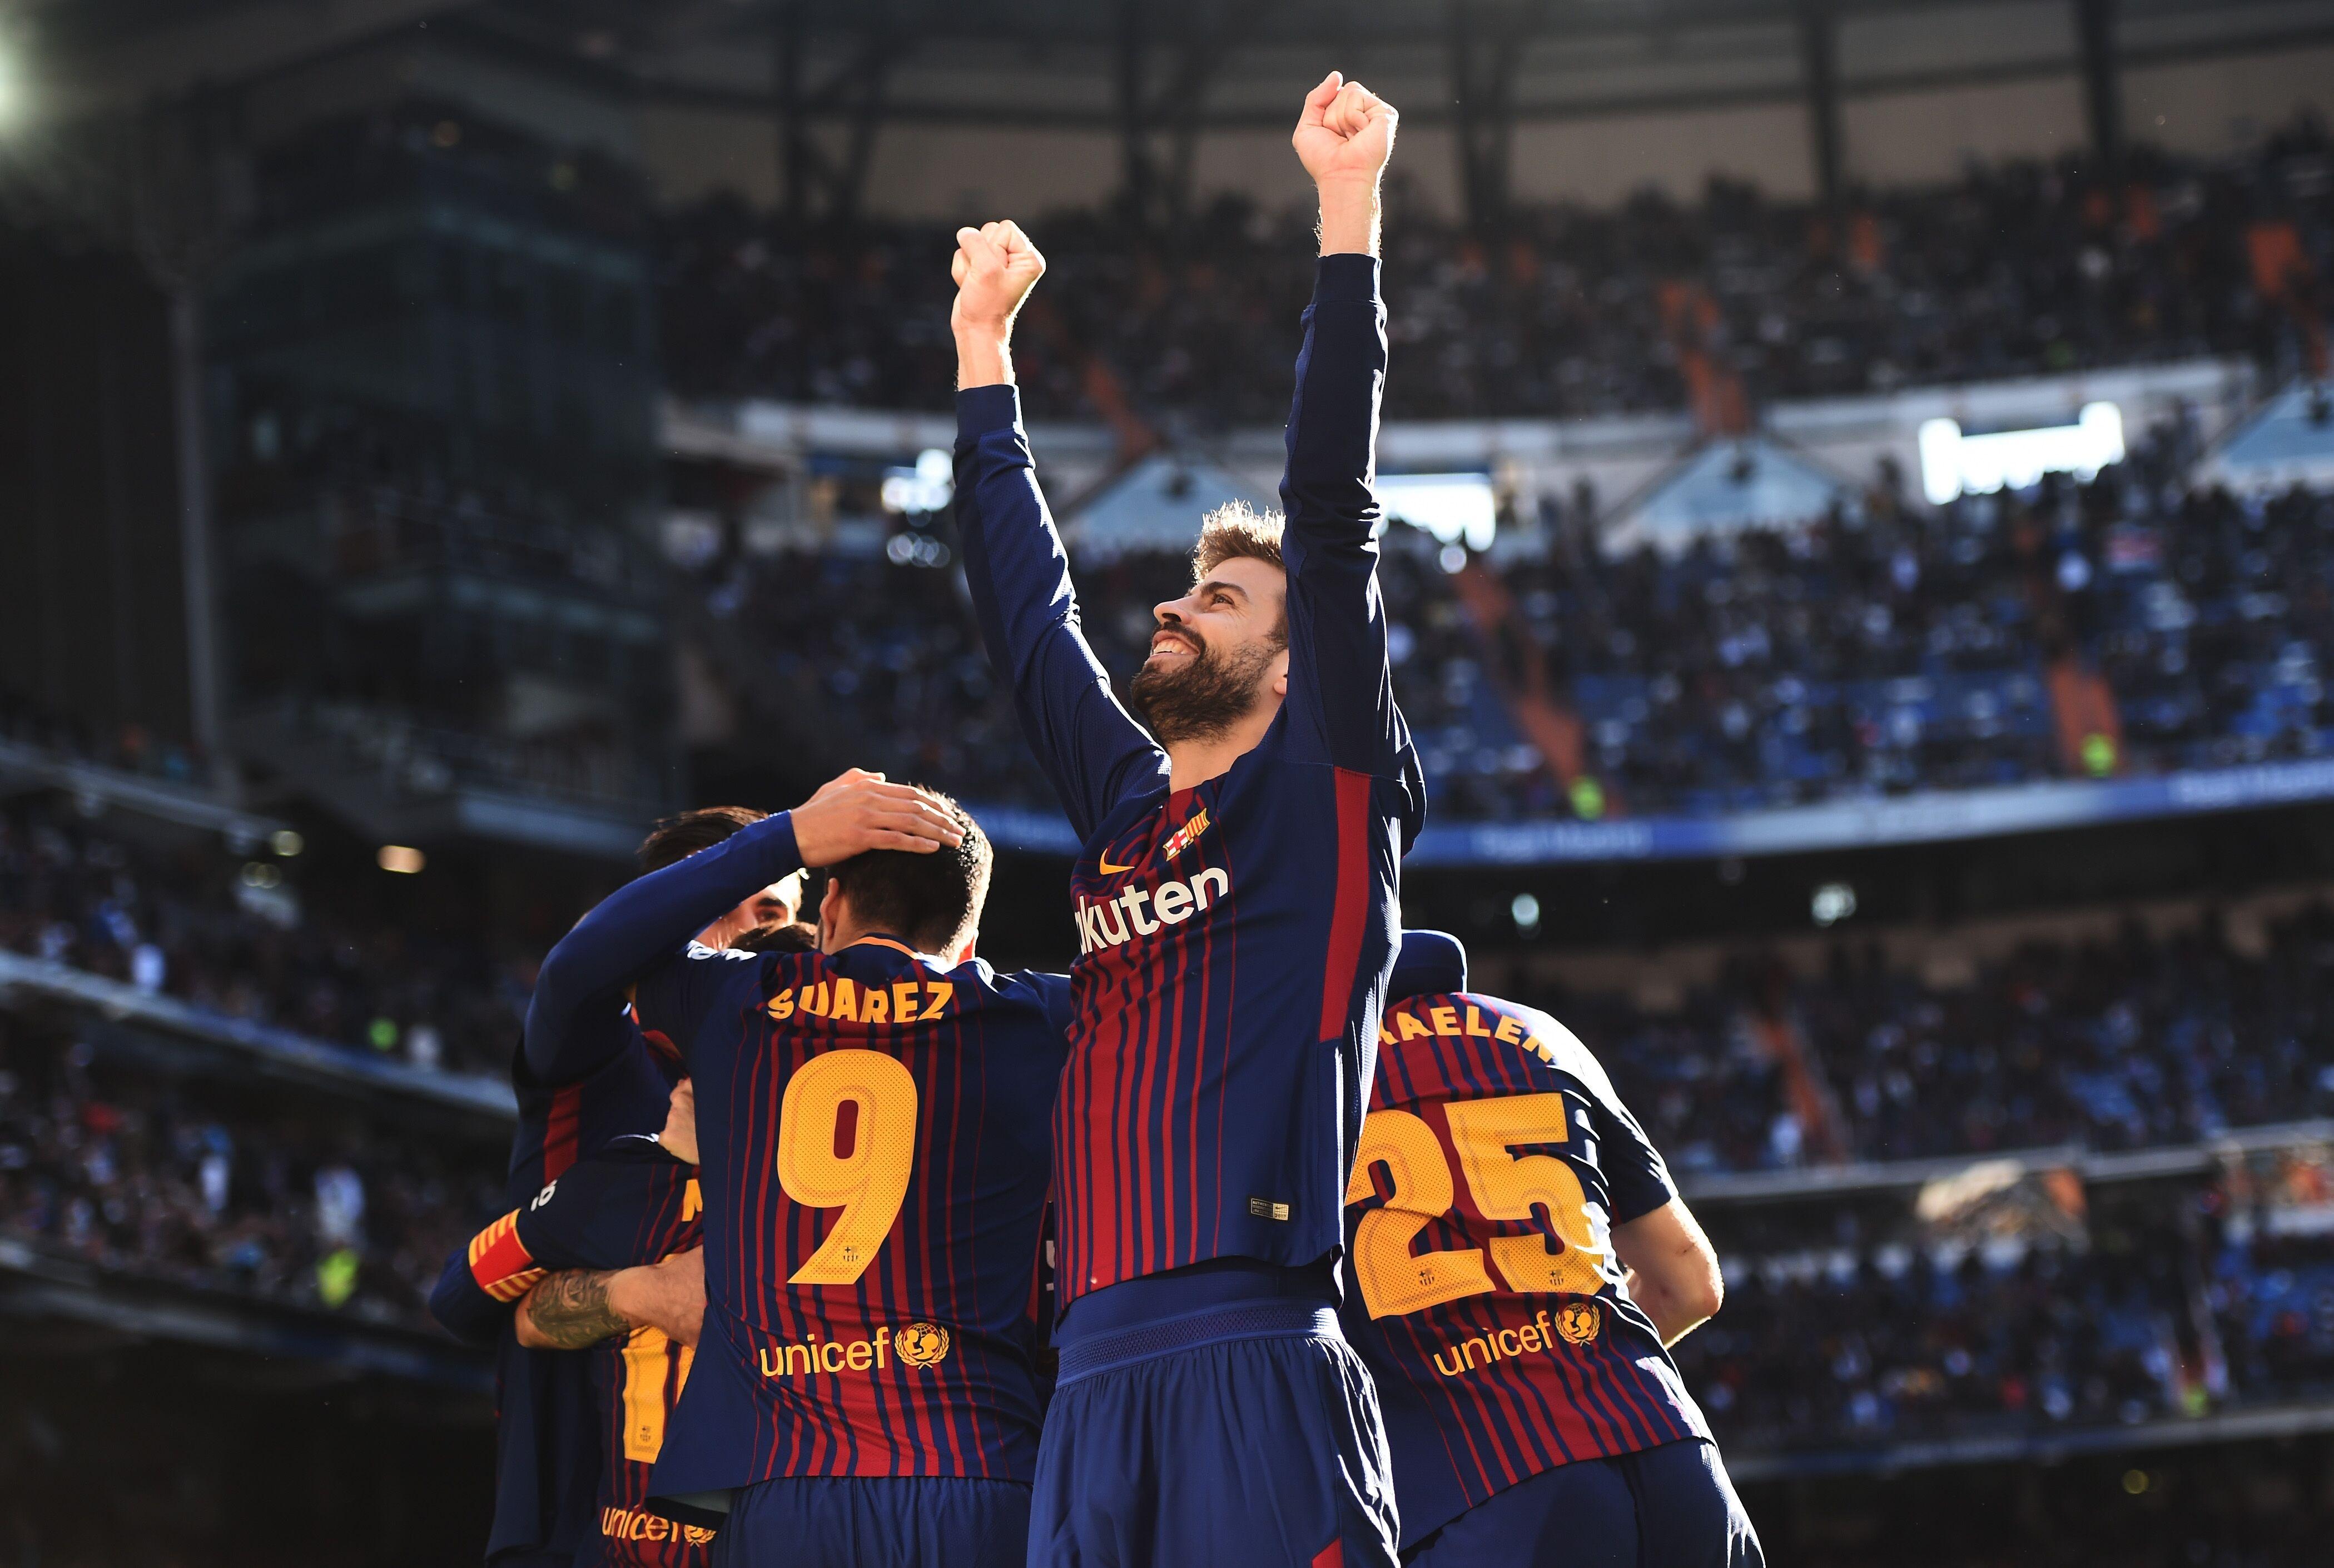 Barcelona Star Gerard Pique Celebrates His 31st Birthday